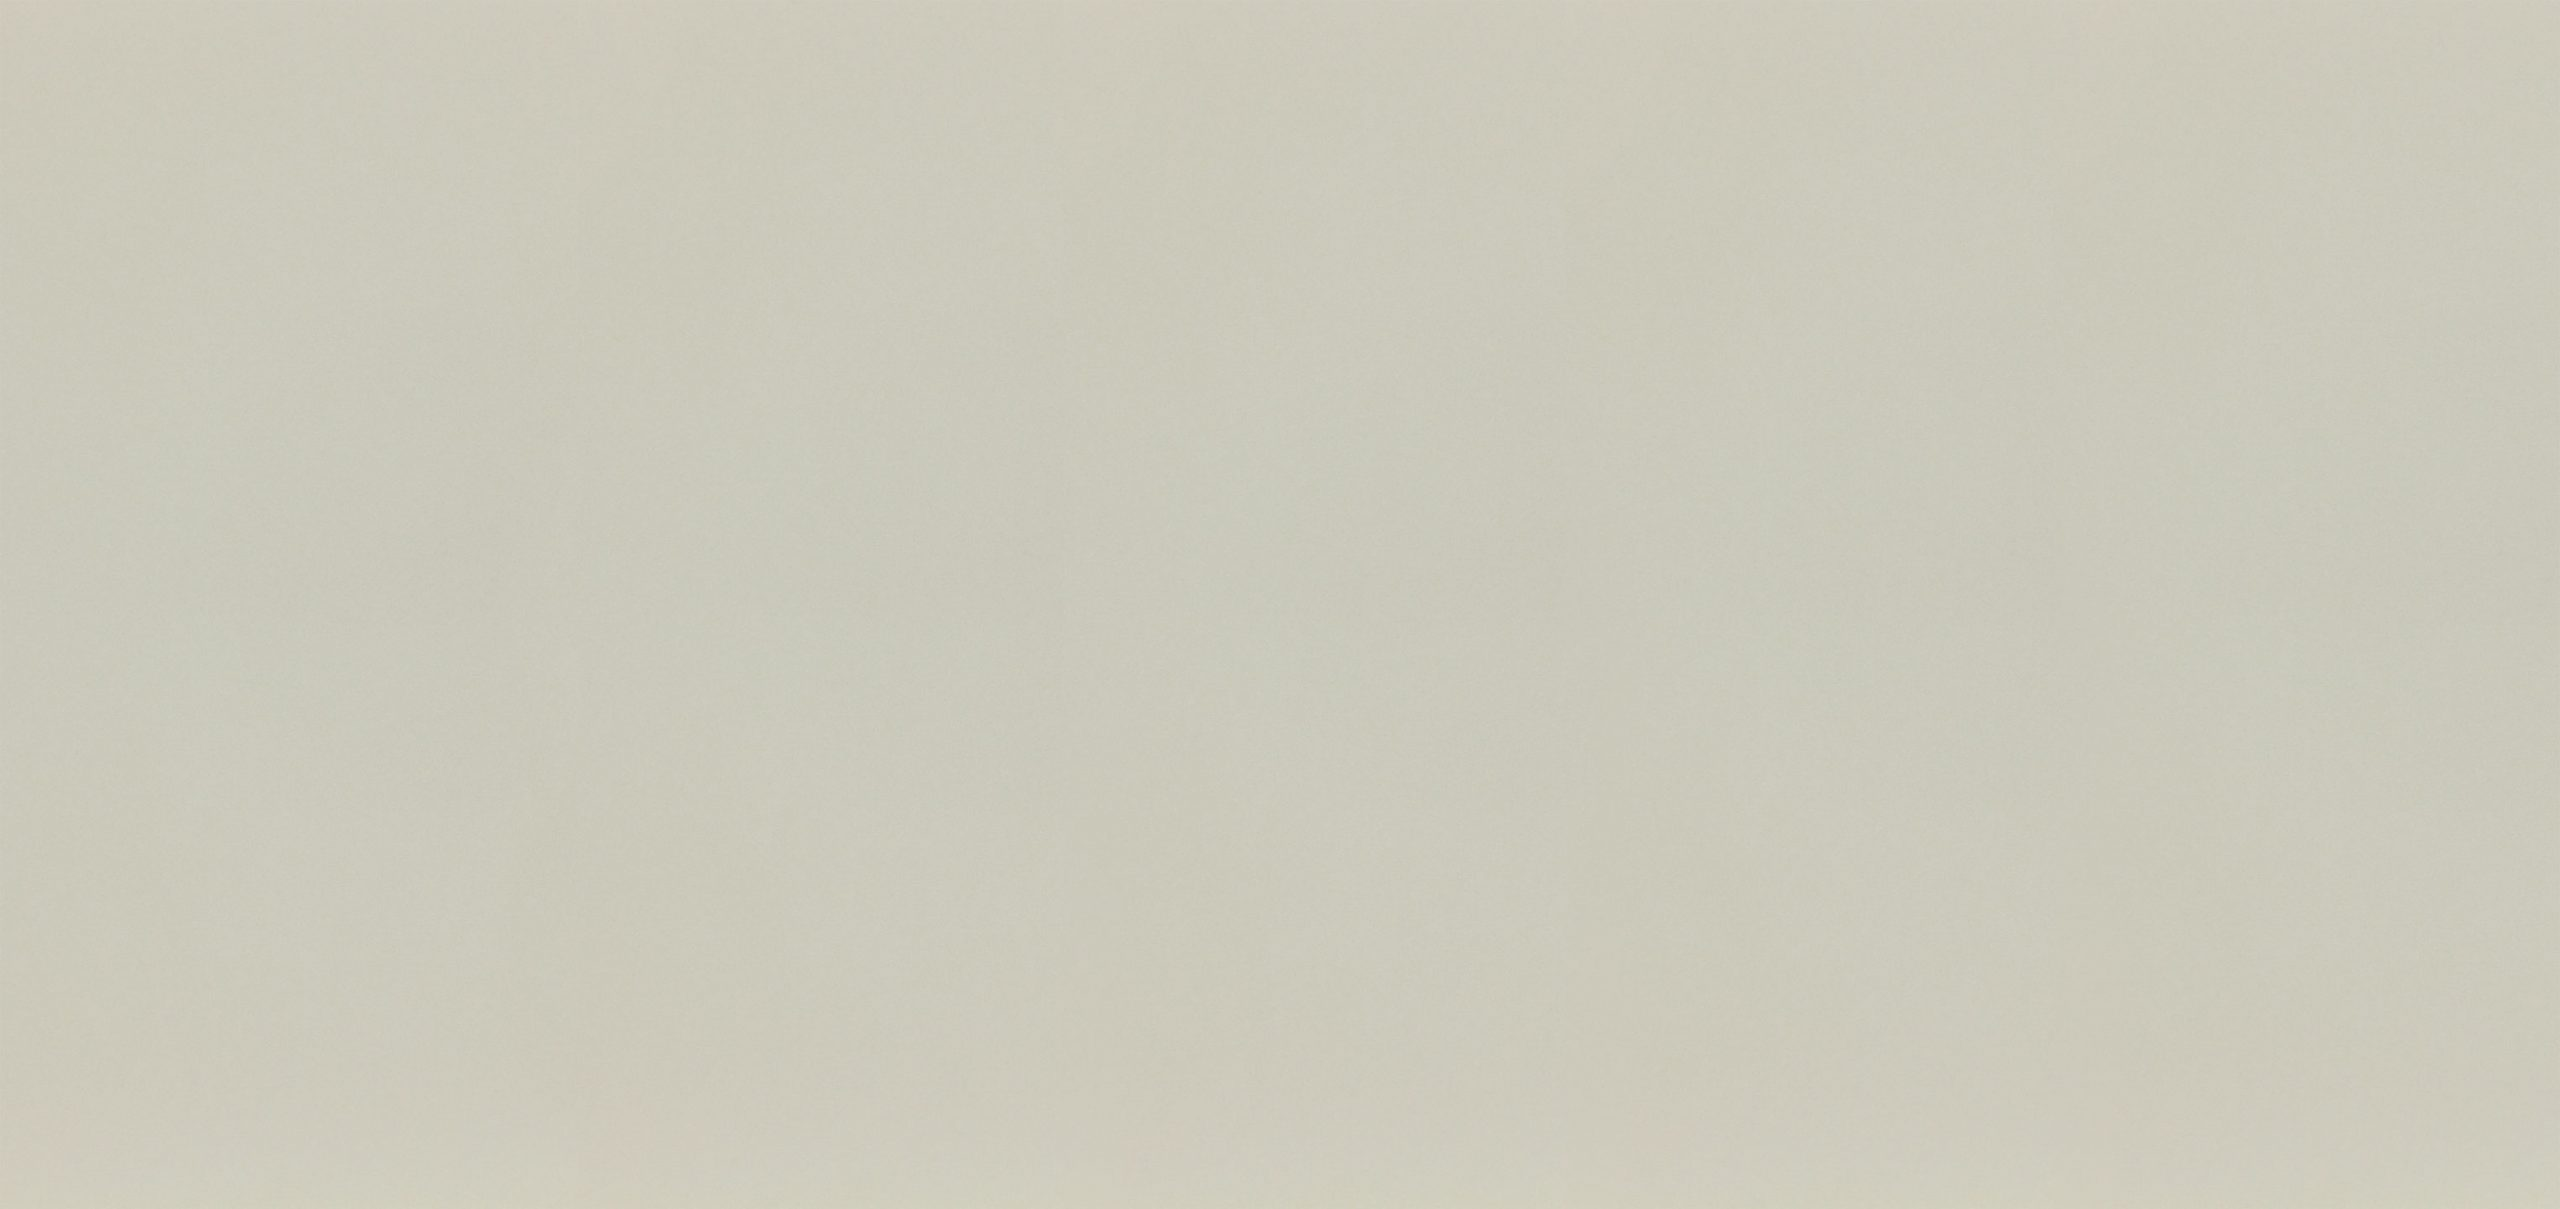 Vicostone Beige Pearl BQ240 02